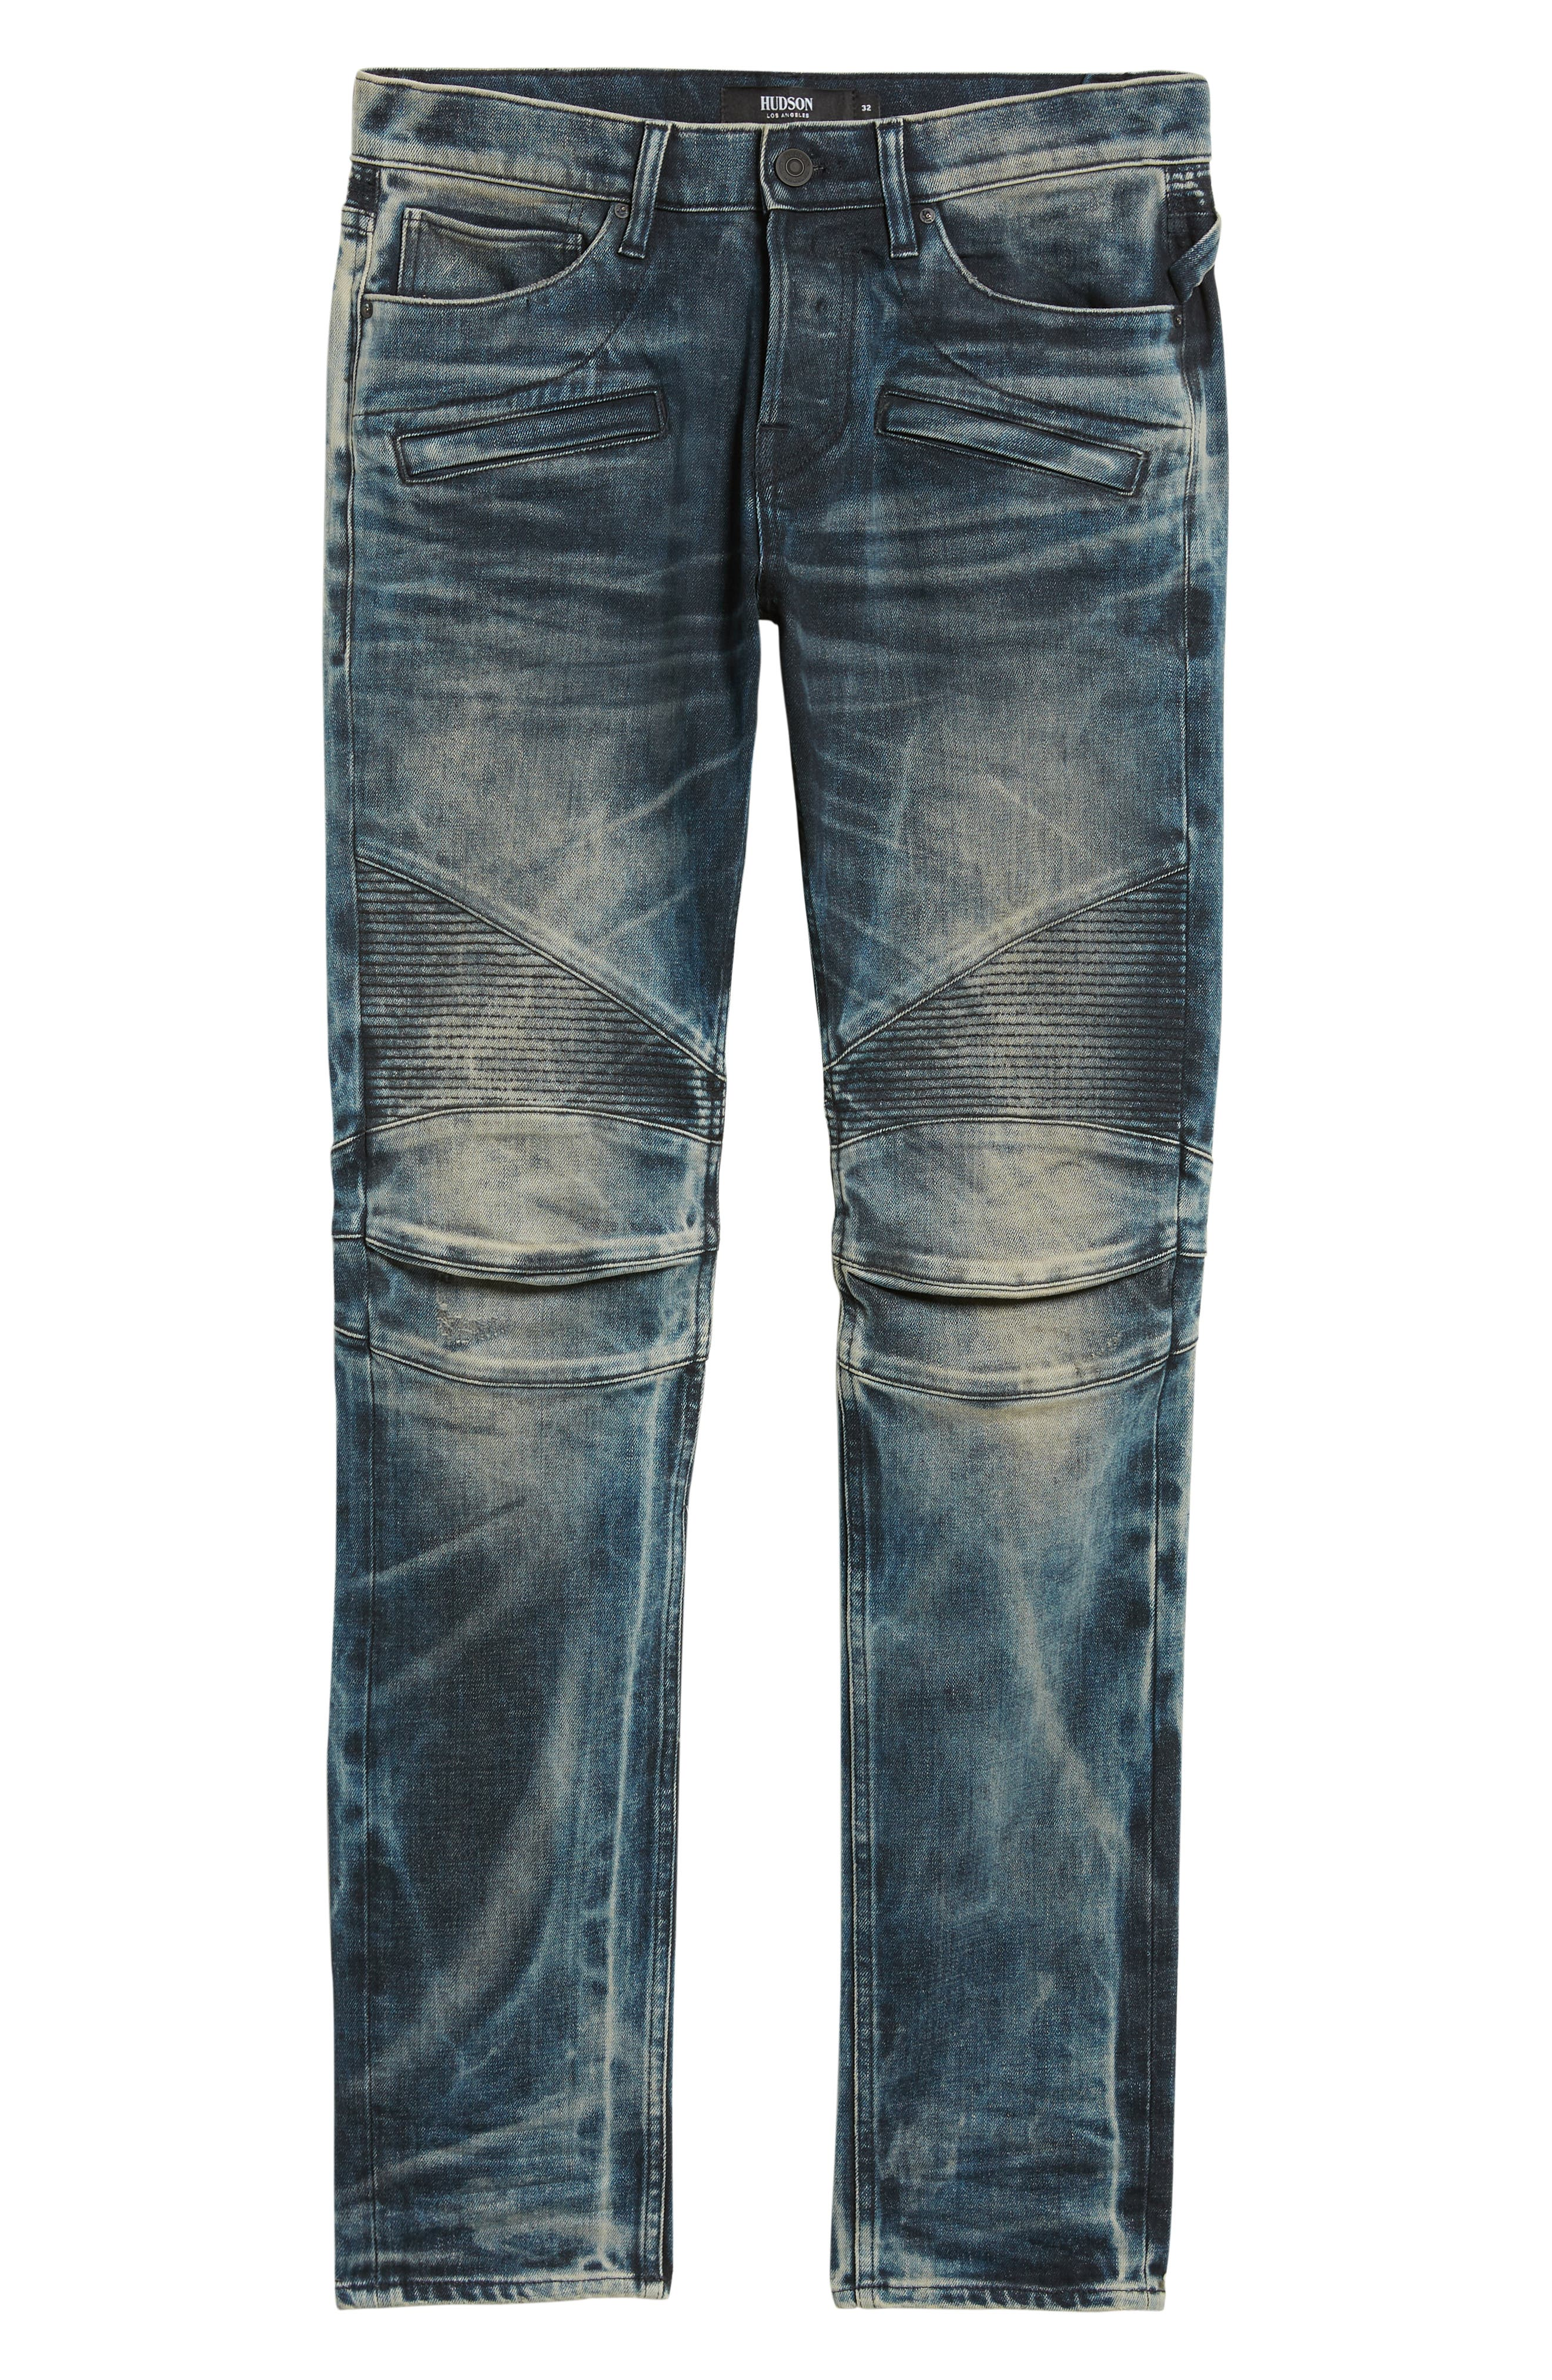 Blinder Biker Skinny Fit Jeans,                             Alternate thumbnail 6, color,                             MARTINO